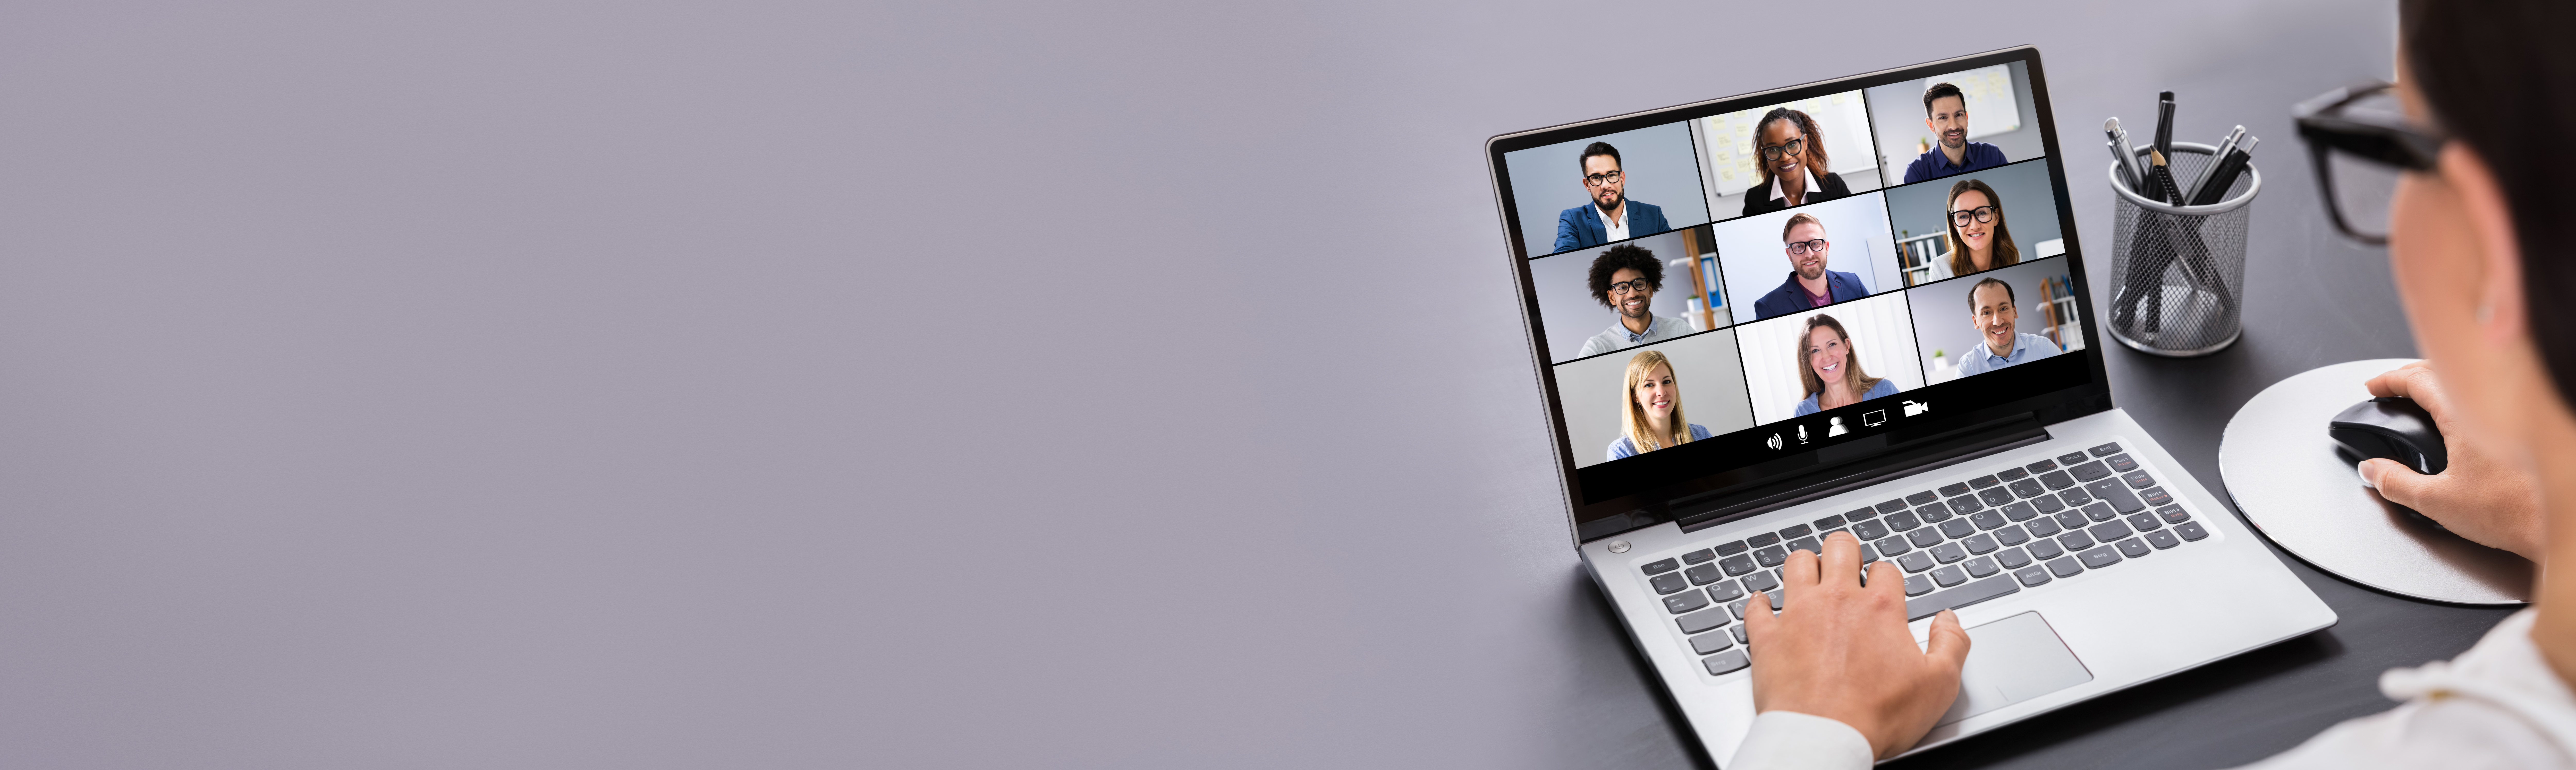 Virtual Meeting Page Image